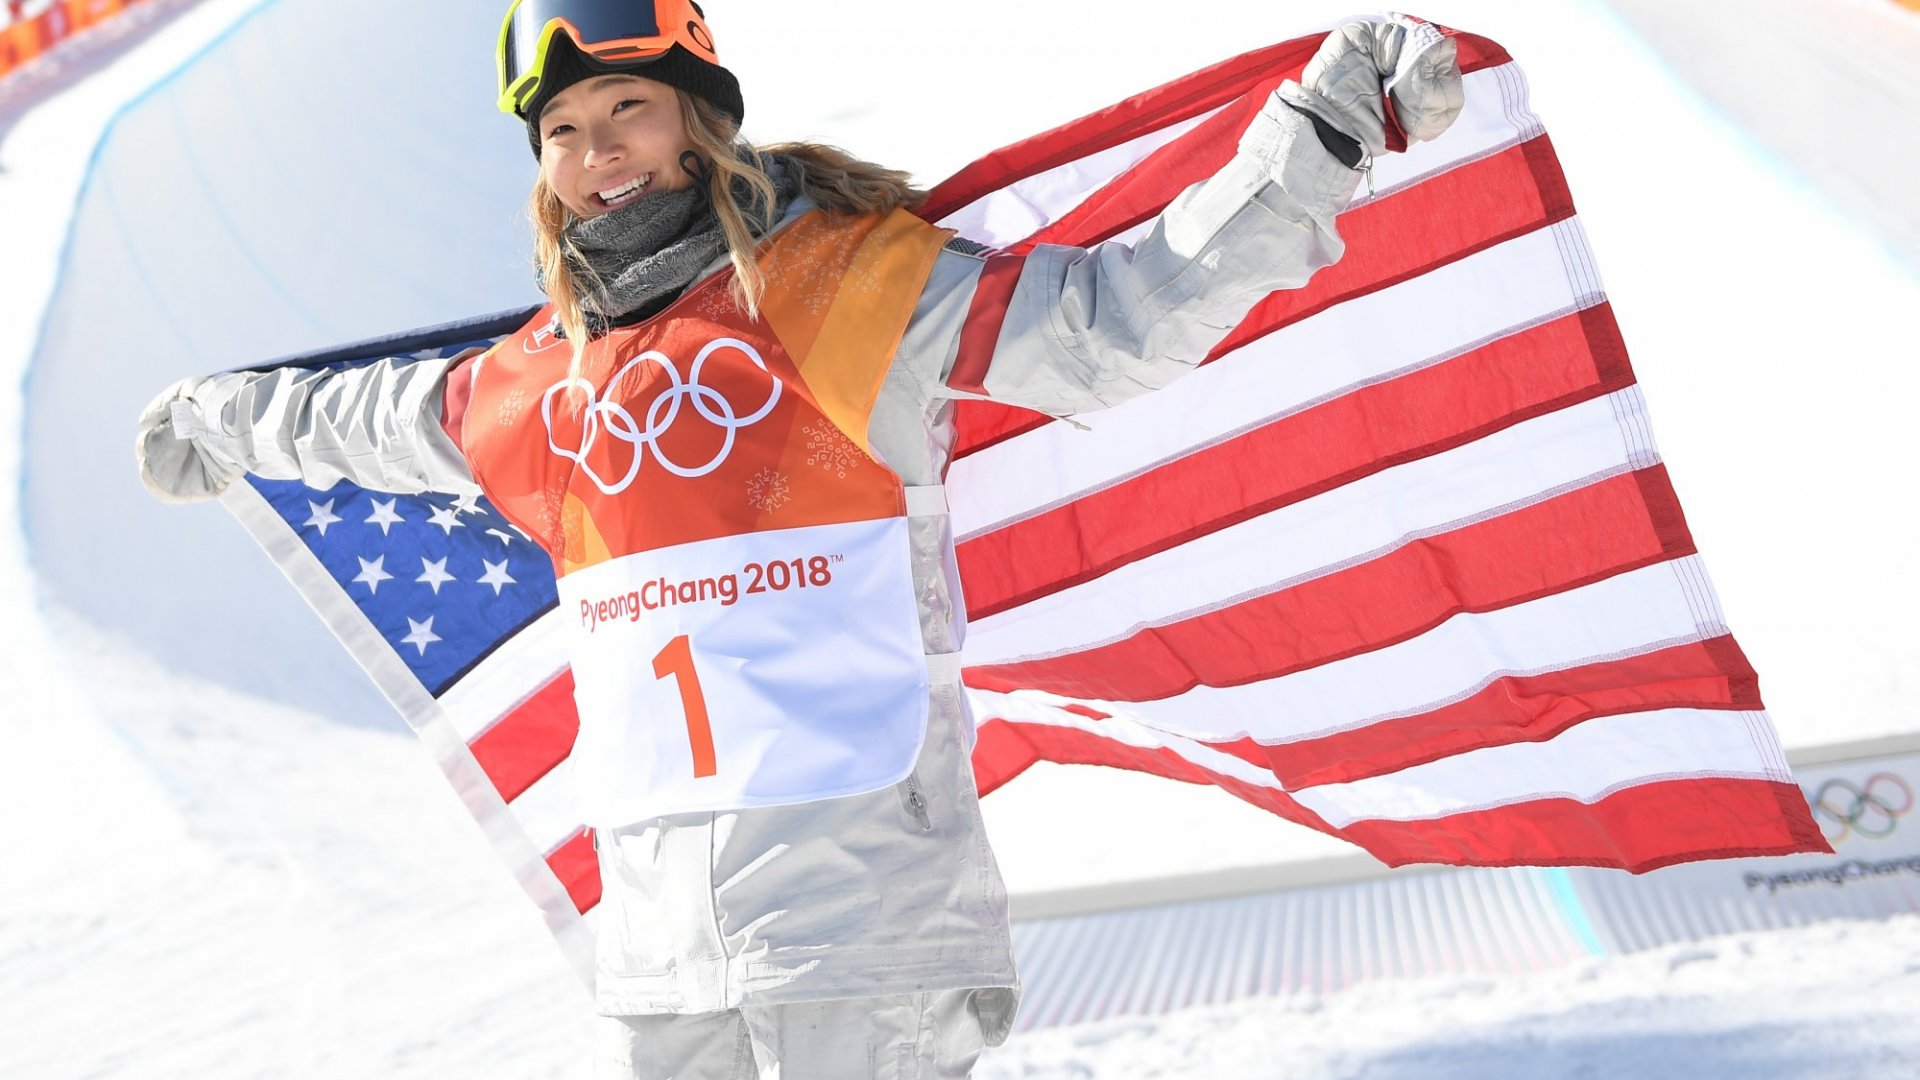 Gold medalist Chloe Kim has become a social media superstar.